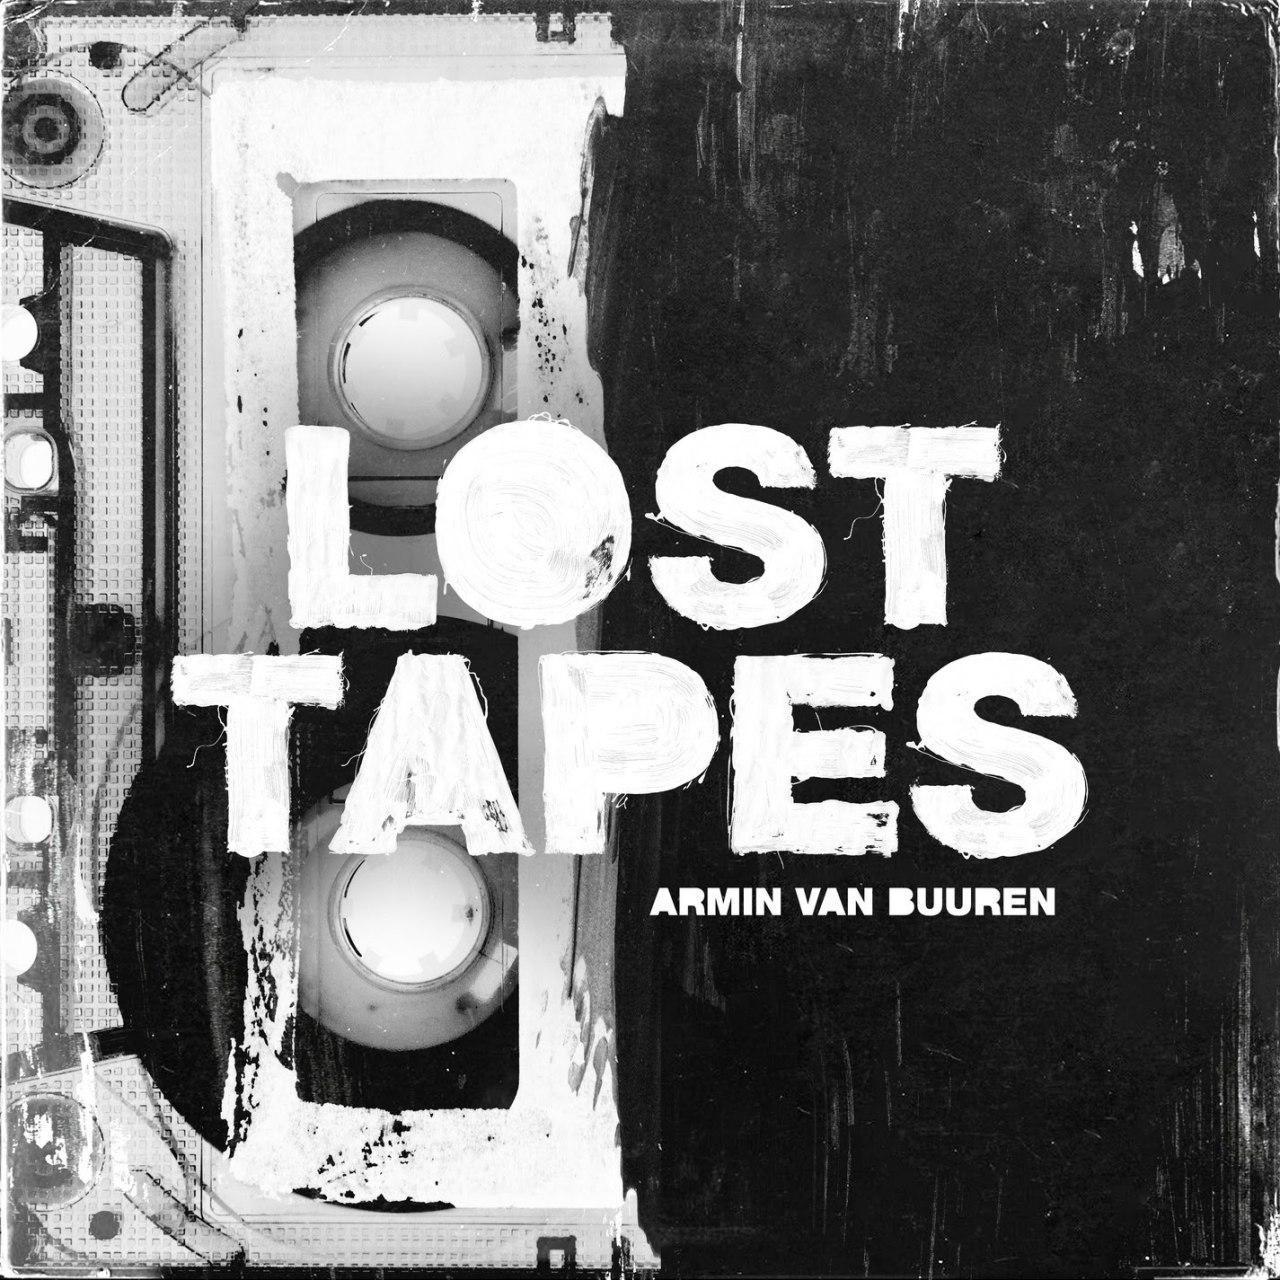 Armin van Buuren - Lost Tapes LP (incl. Extended Remixes) Trance ...